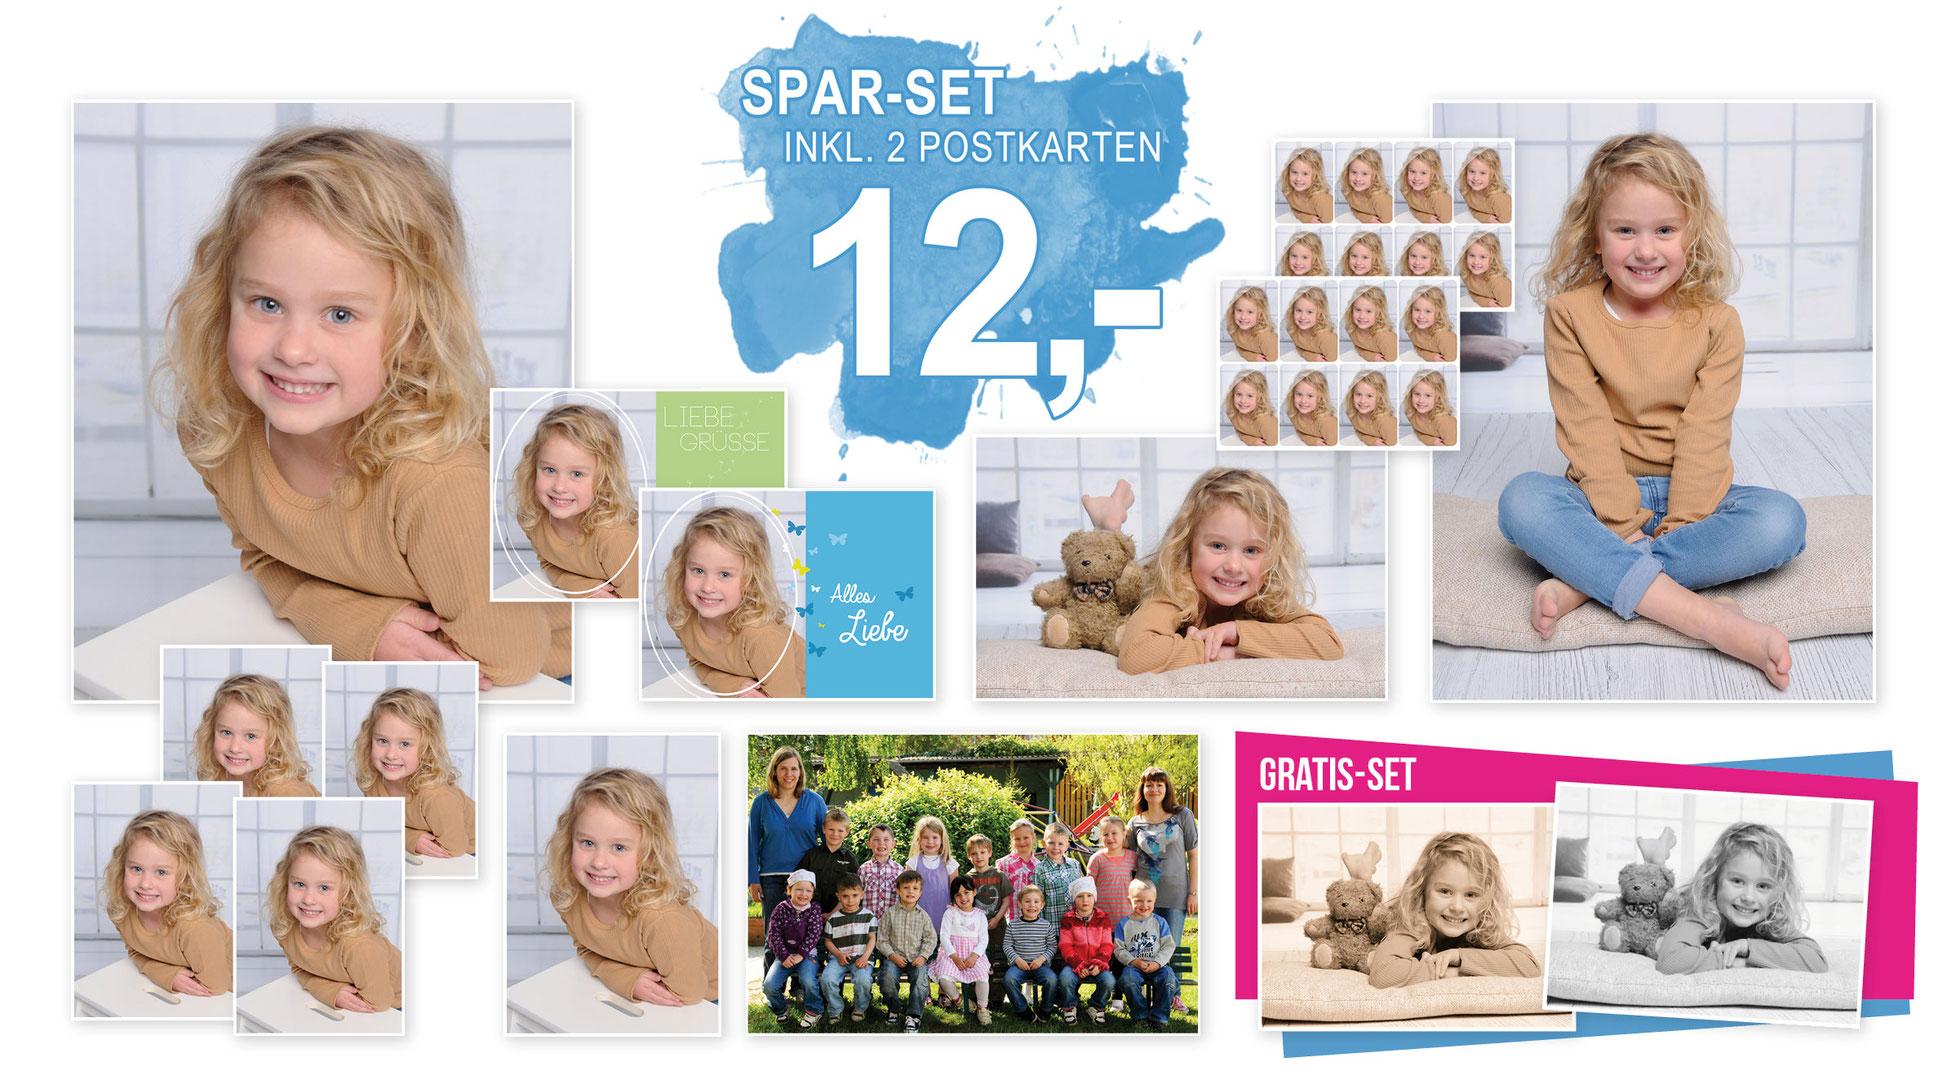 Kindergartenfotograf Schulfotograf Kitafotografie Schulfotografie Angebot